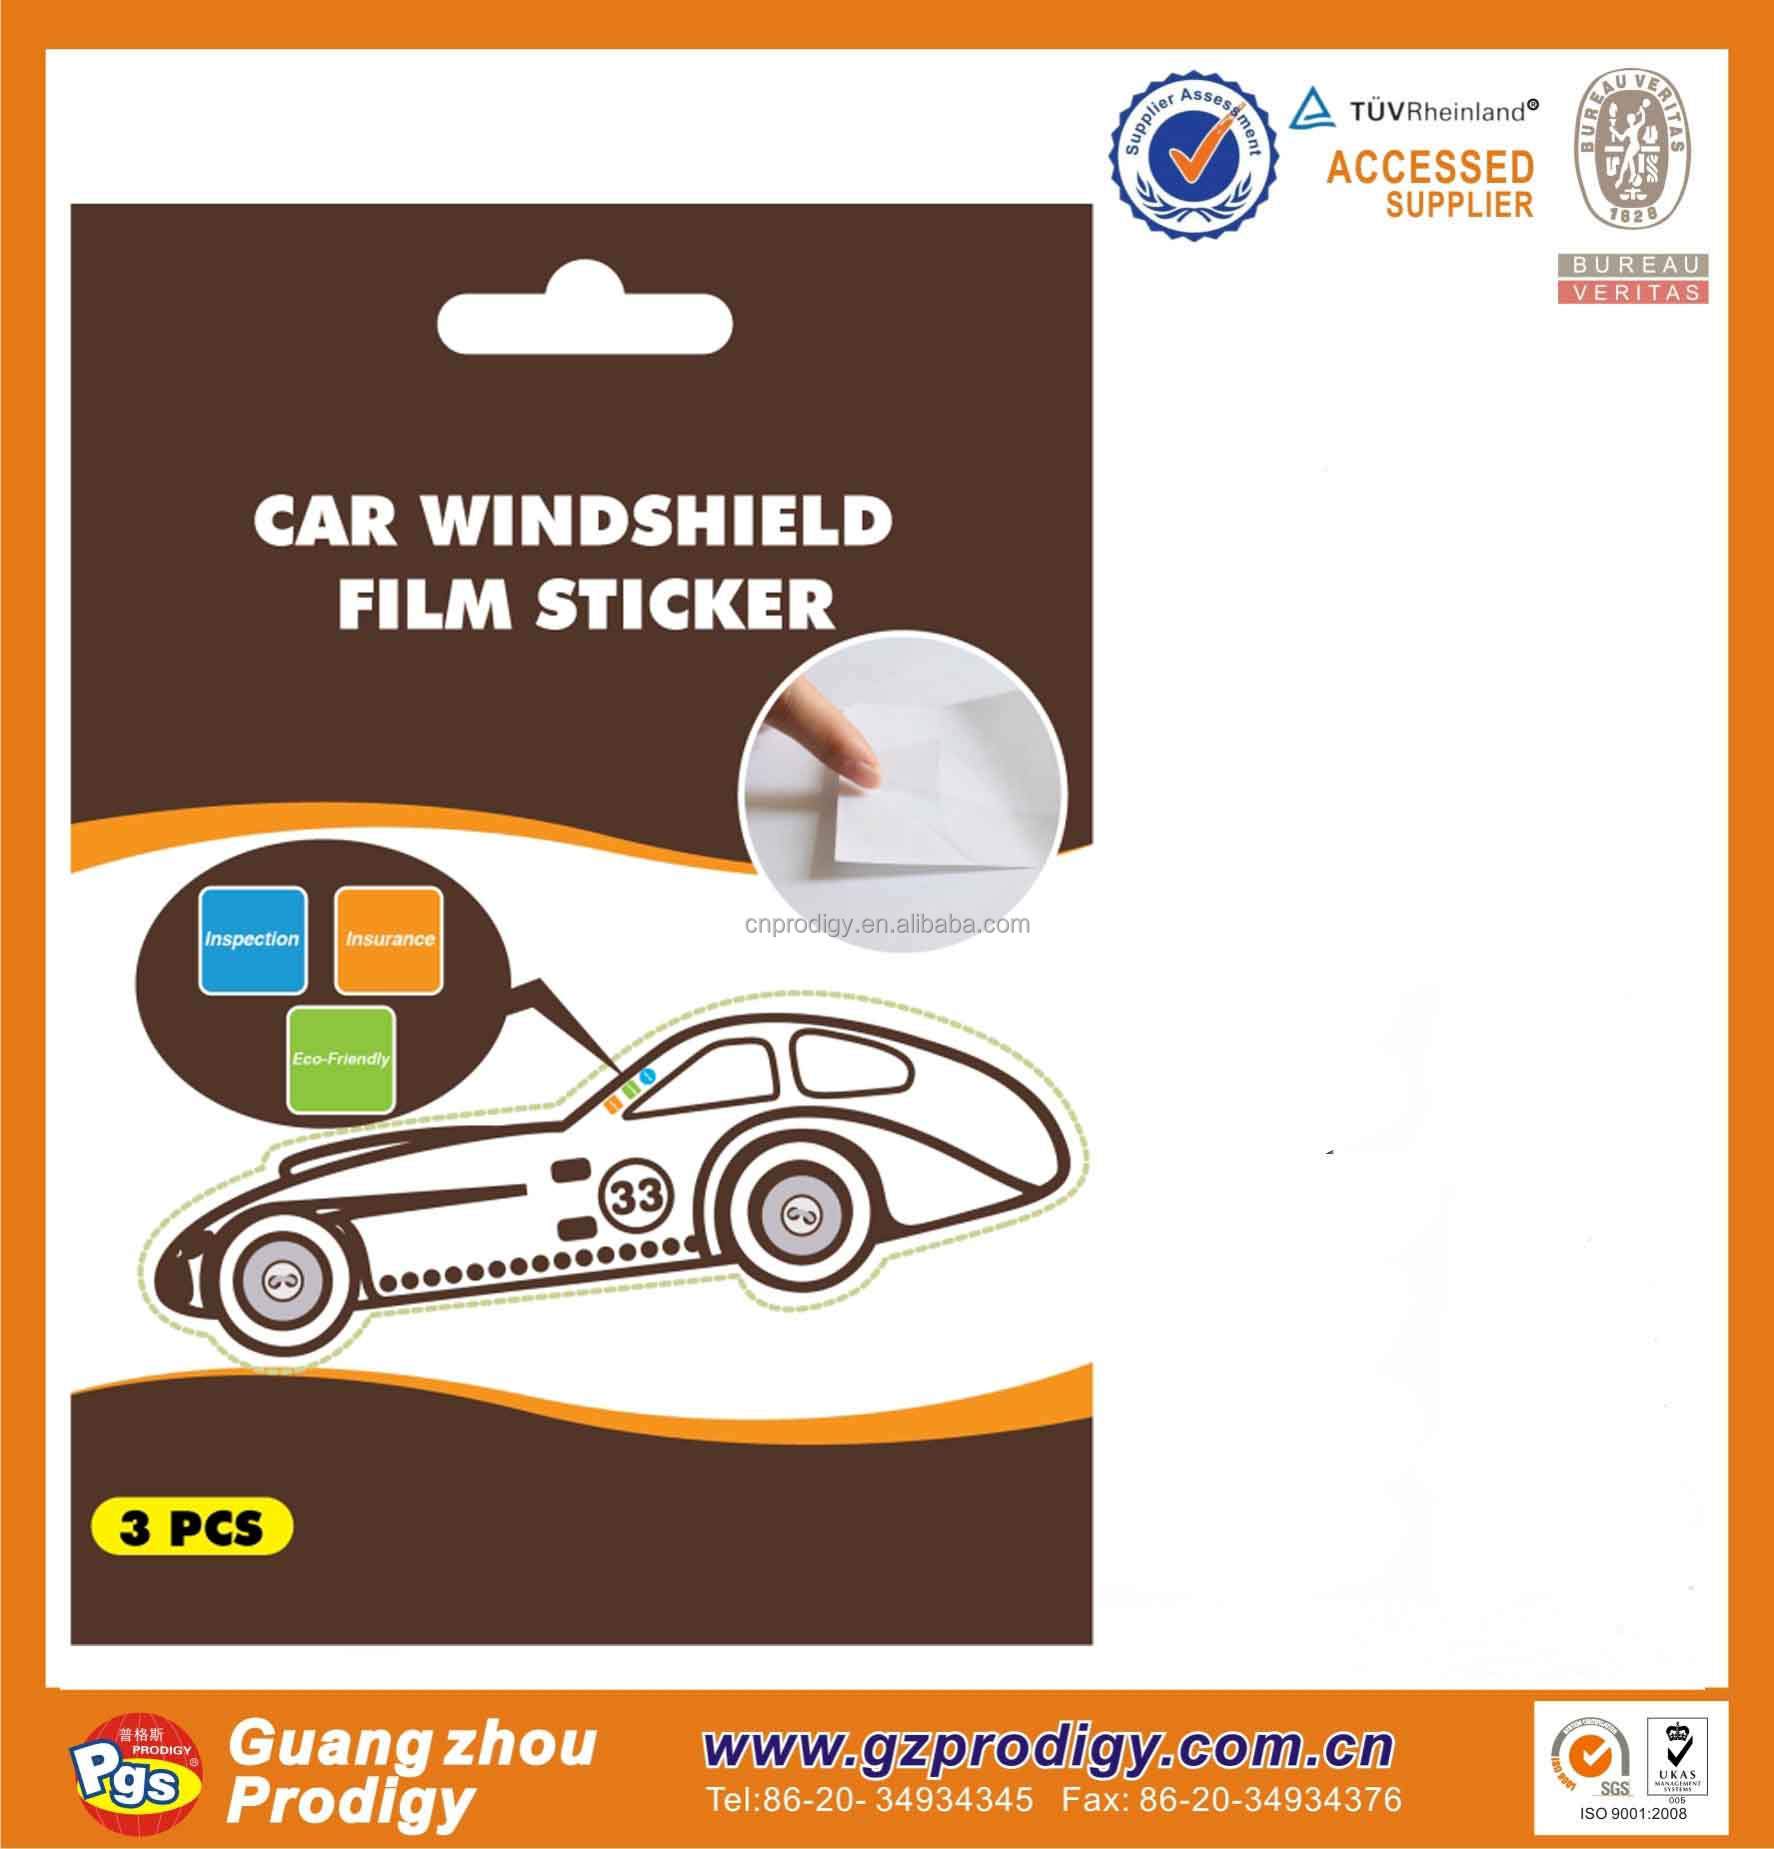 Car sticker design sample - Sample Car Sticker Design Sample Car Sticker Design Suppliers And Manufacturers At Alibaba Com